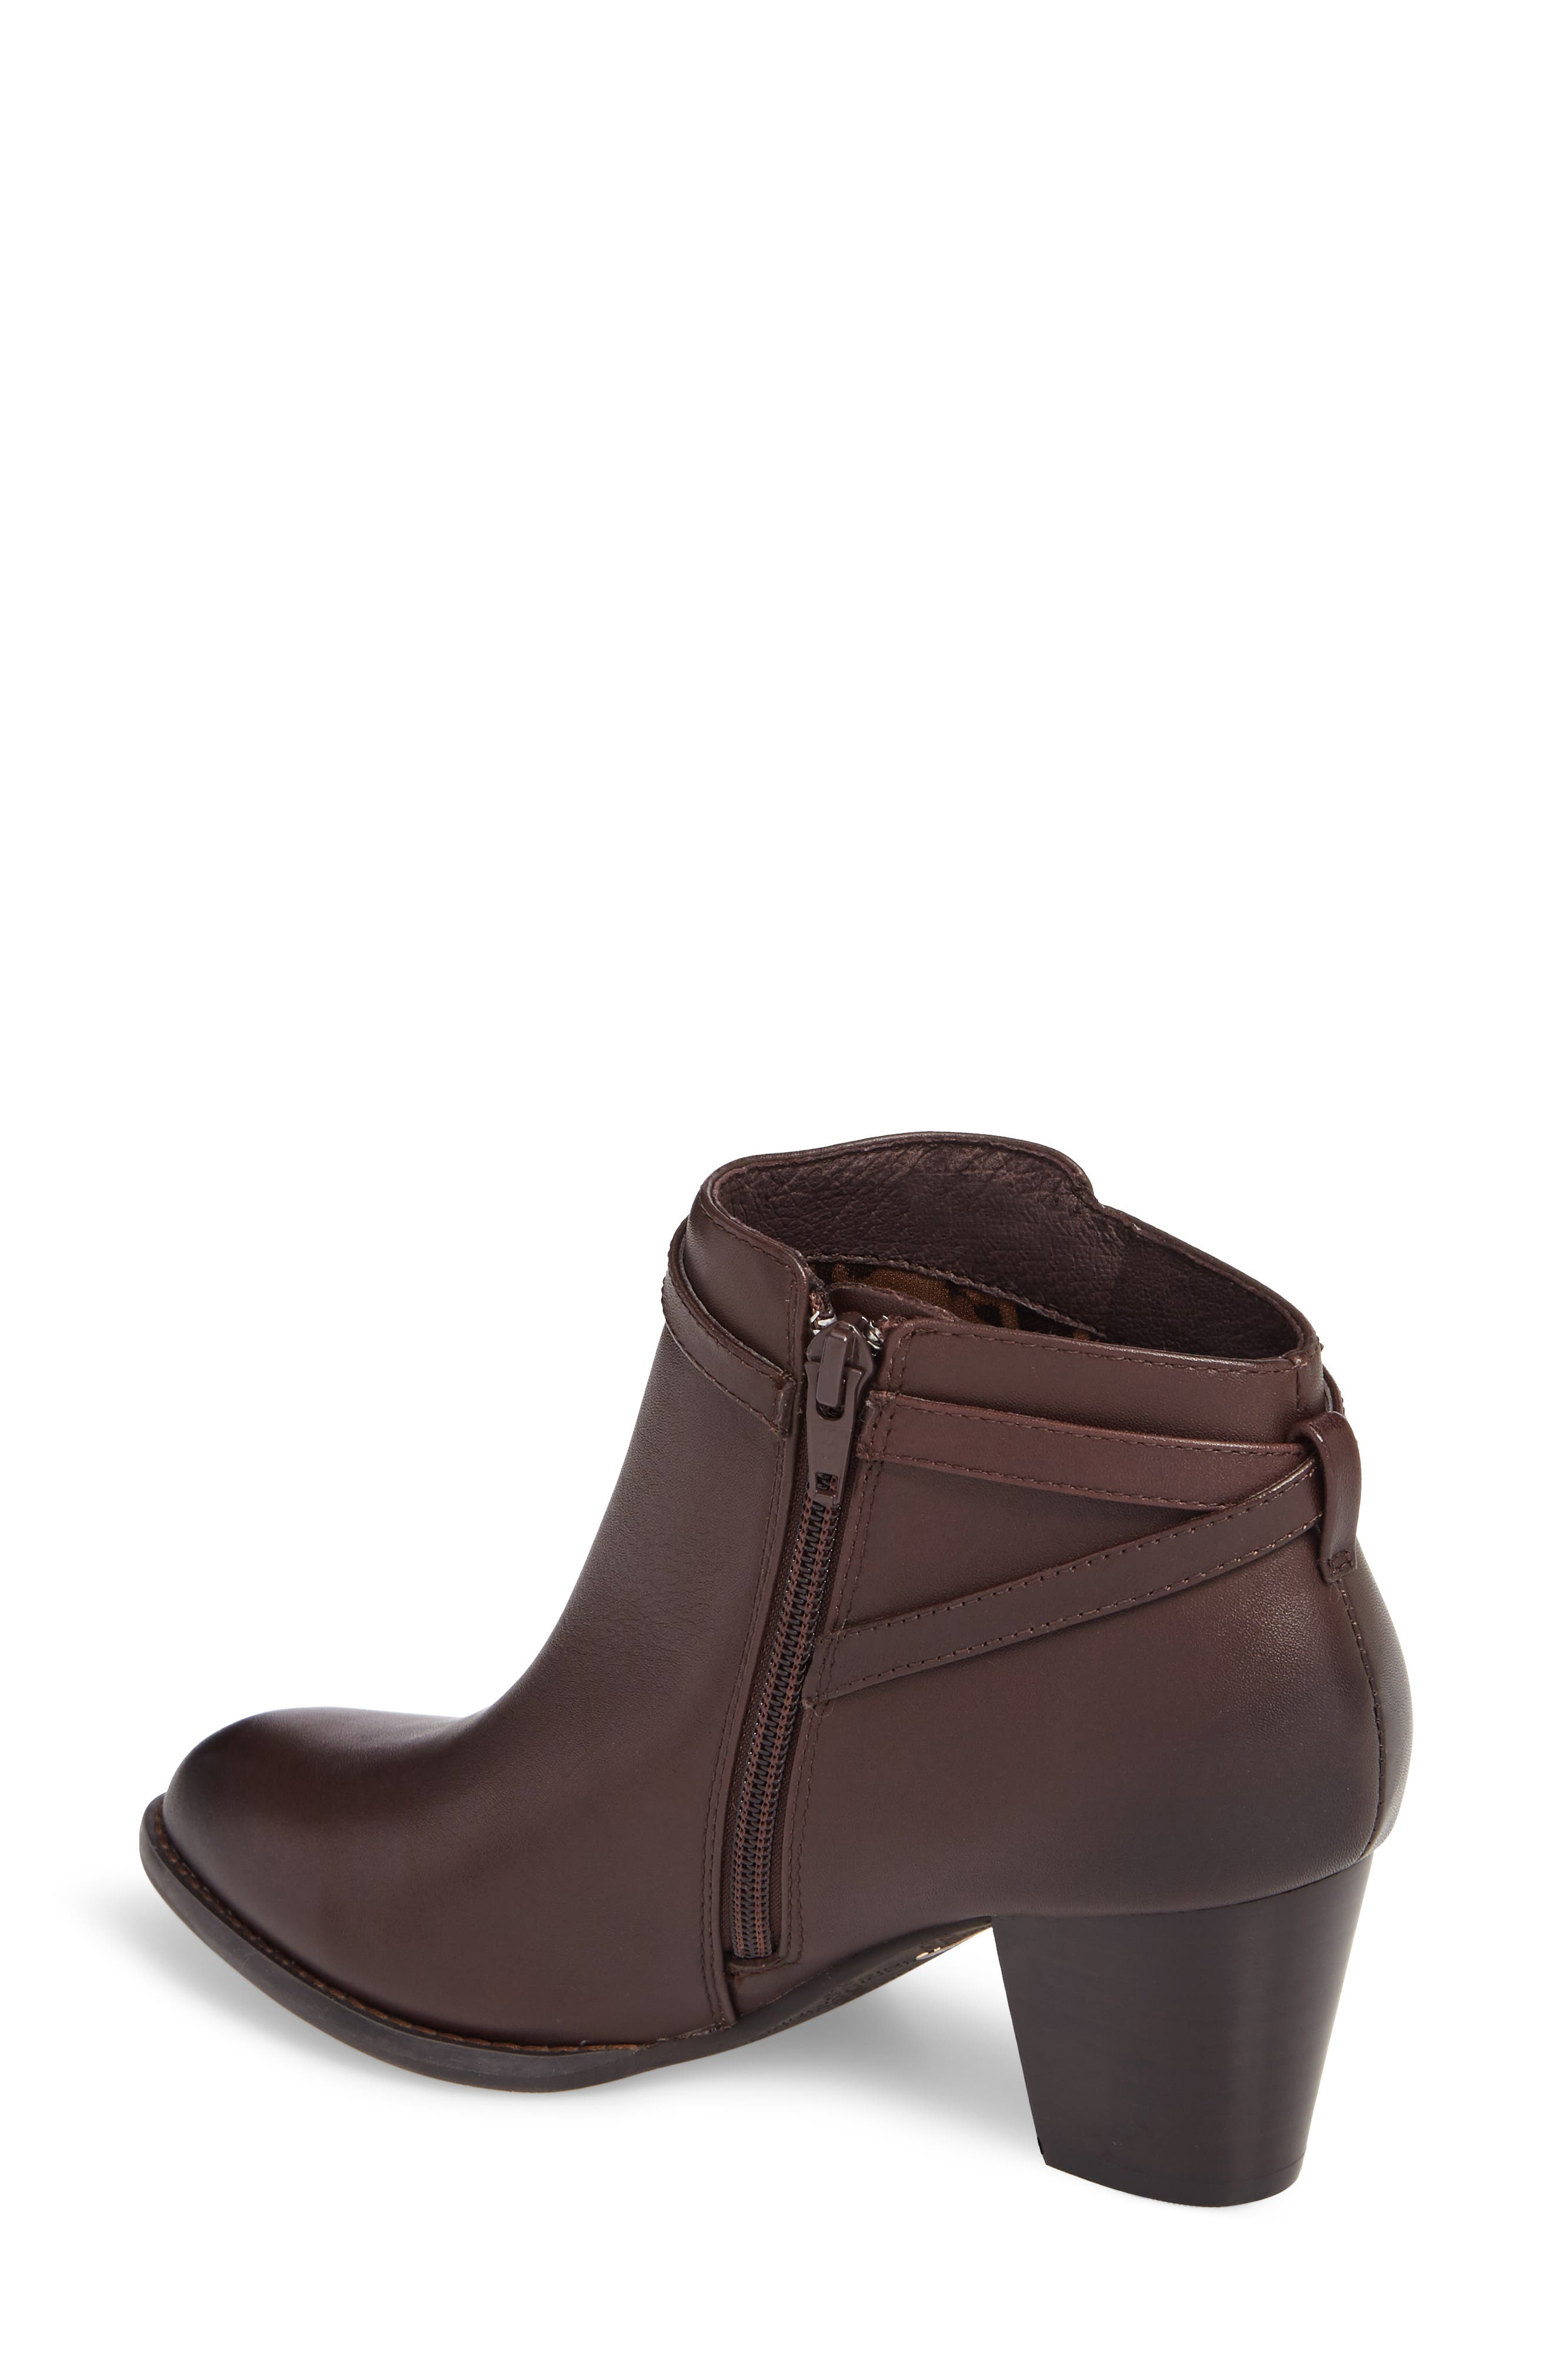 'Upton' Block Heel Boot,                             Alternate thumbnail 4, color,